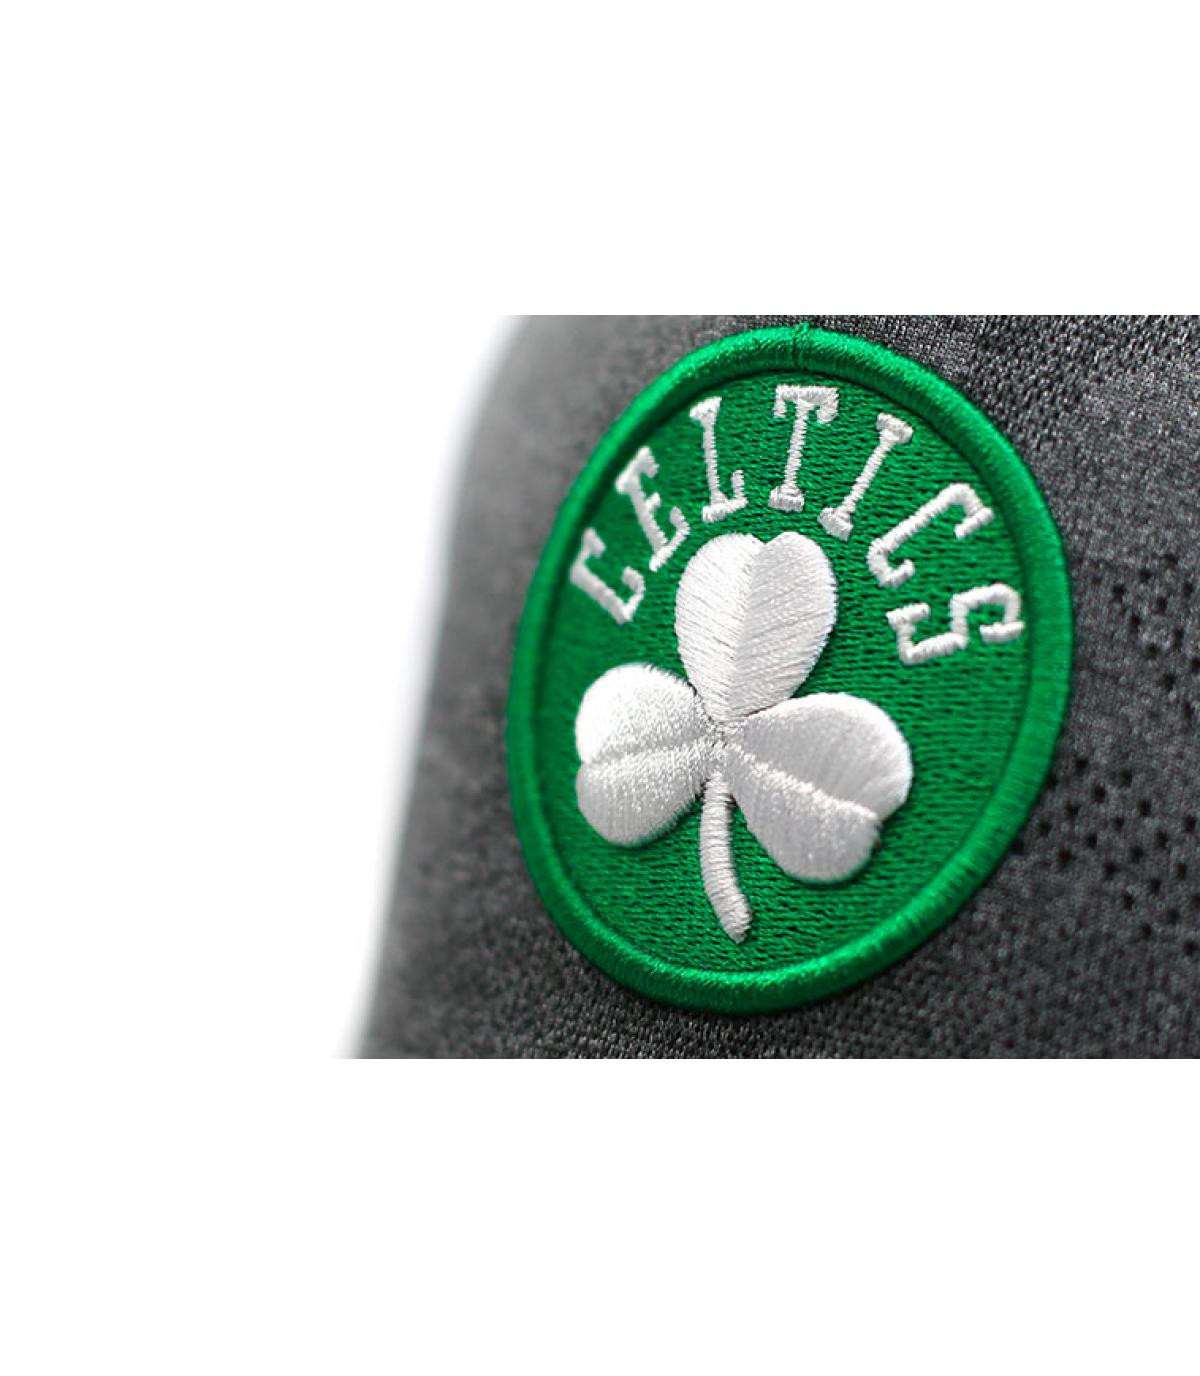 Detalles Enginneered Plus Celtics Aframe black imagen 3